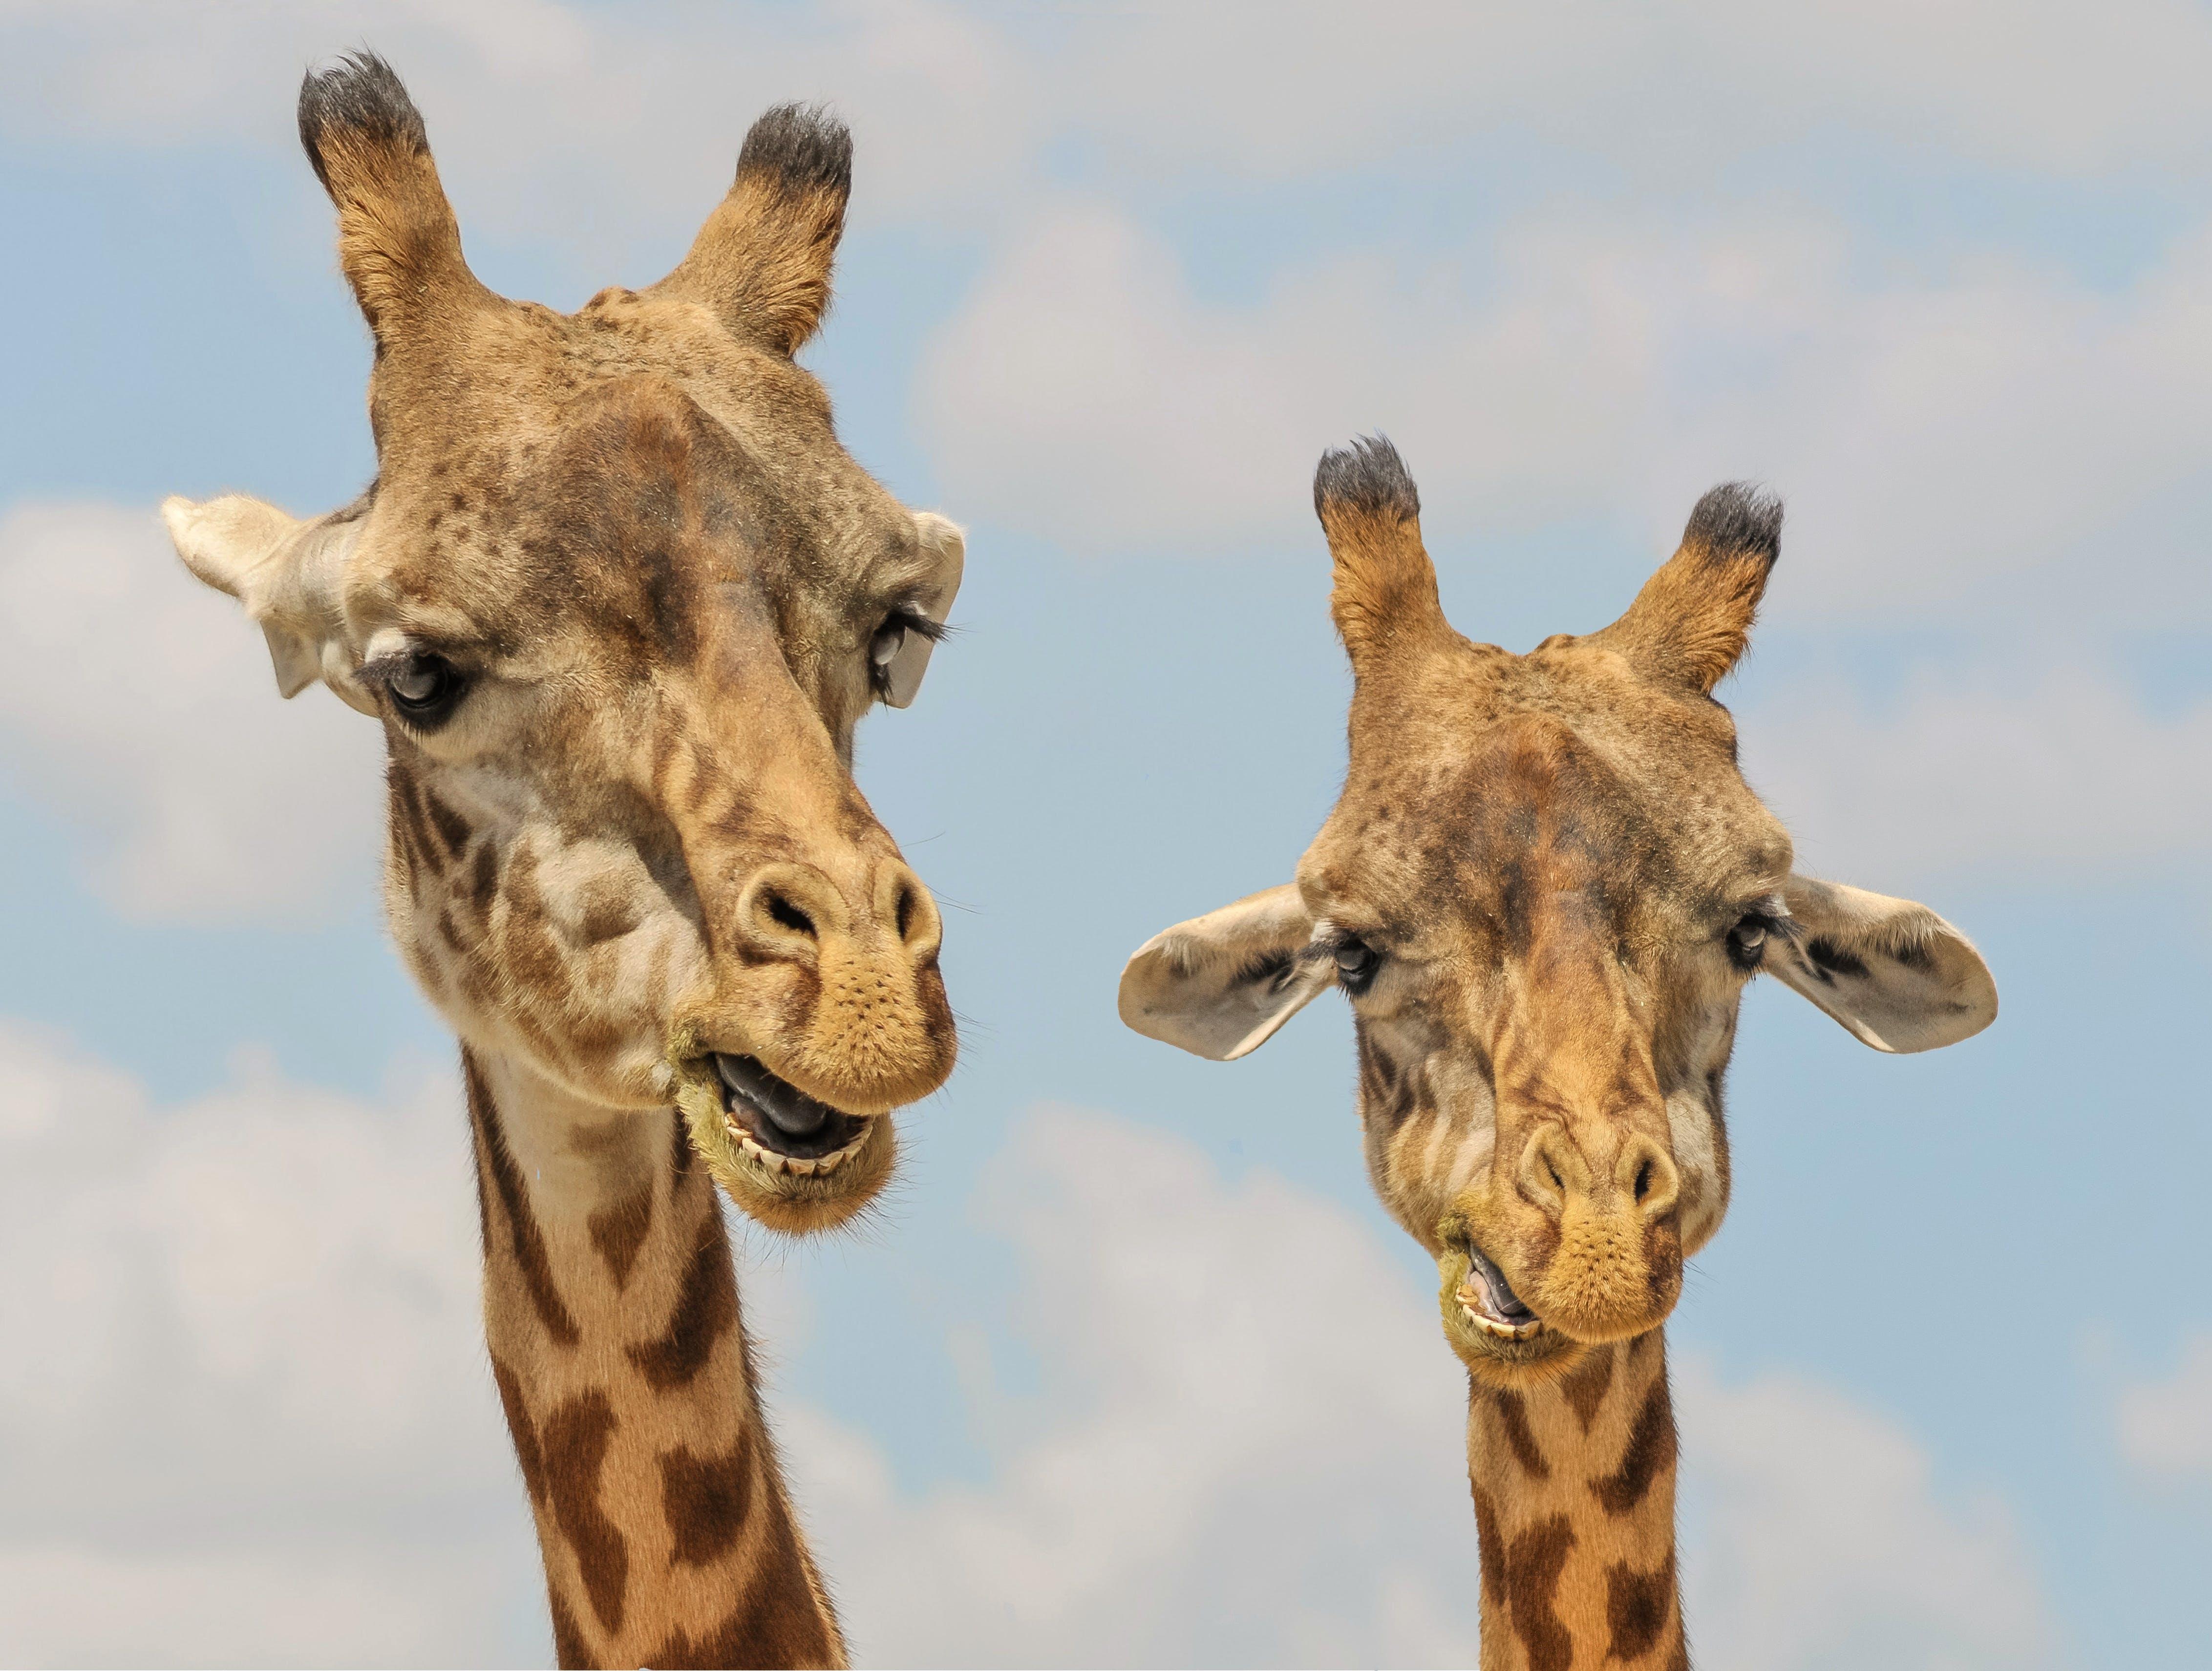 animals, fauna, giraffes